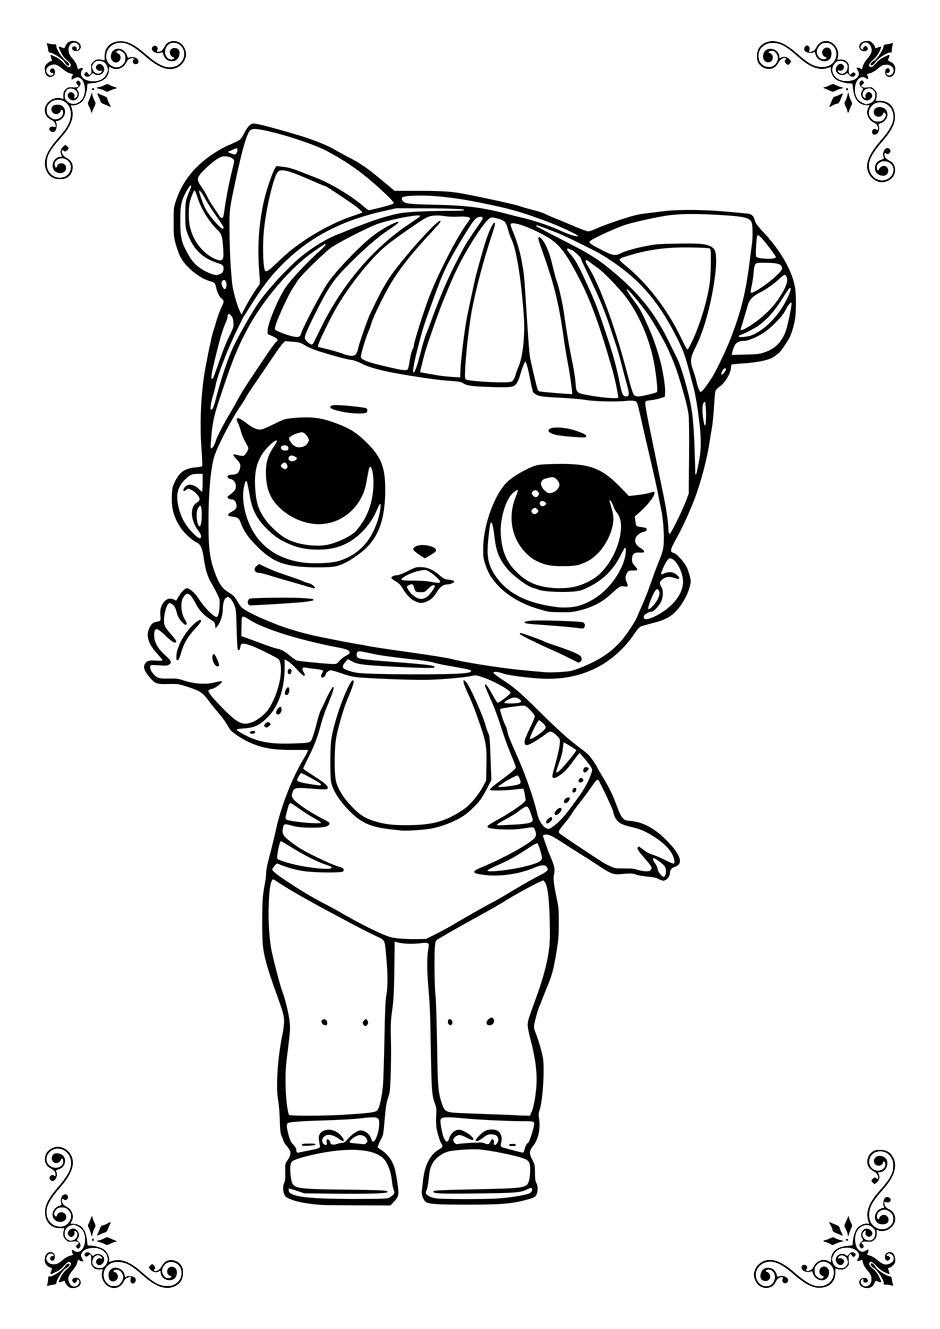 Раскраска: кукла ЛОЛ тигрица — raskraski-a4.ru